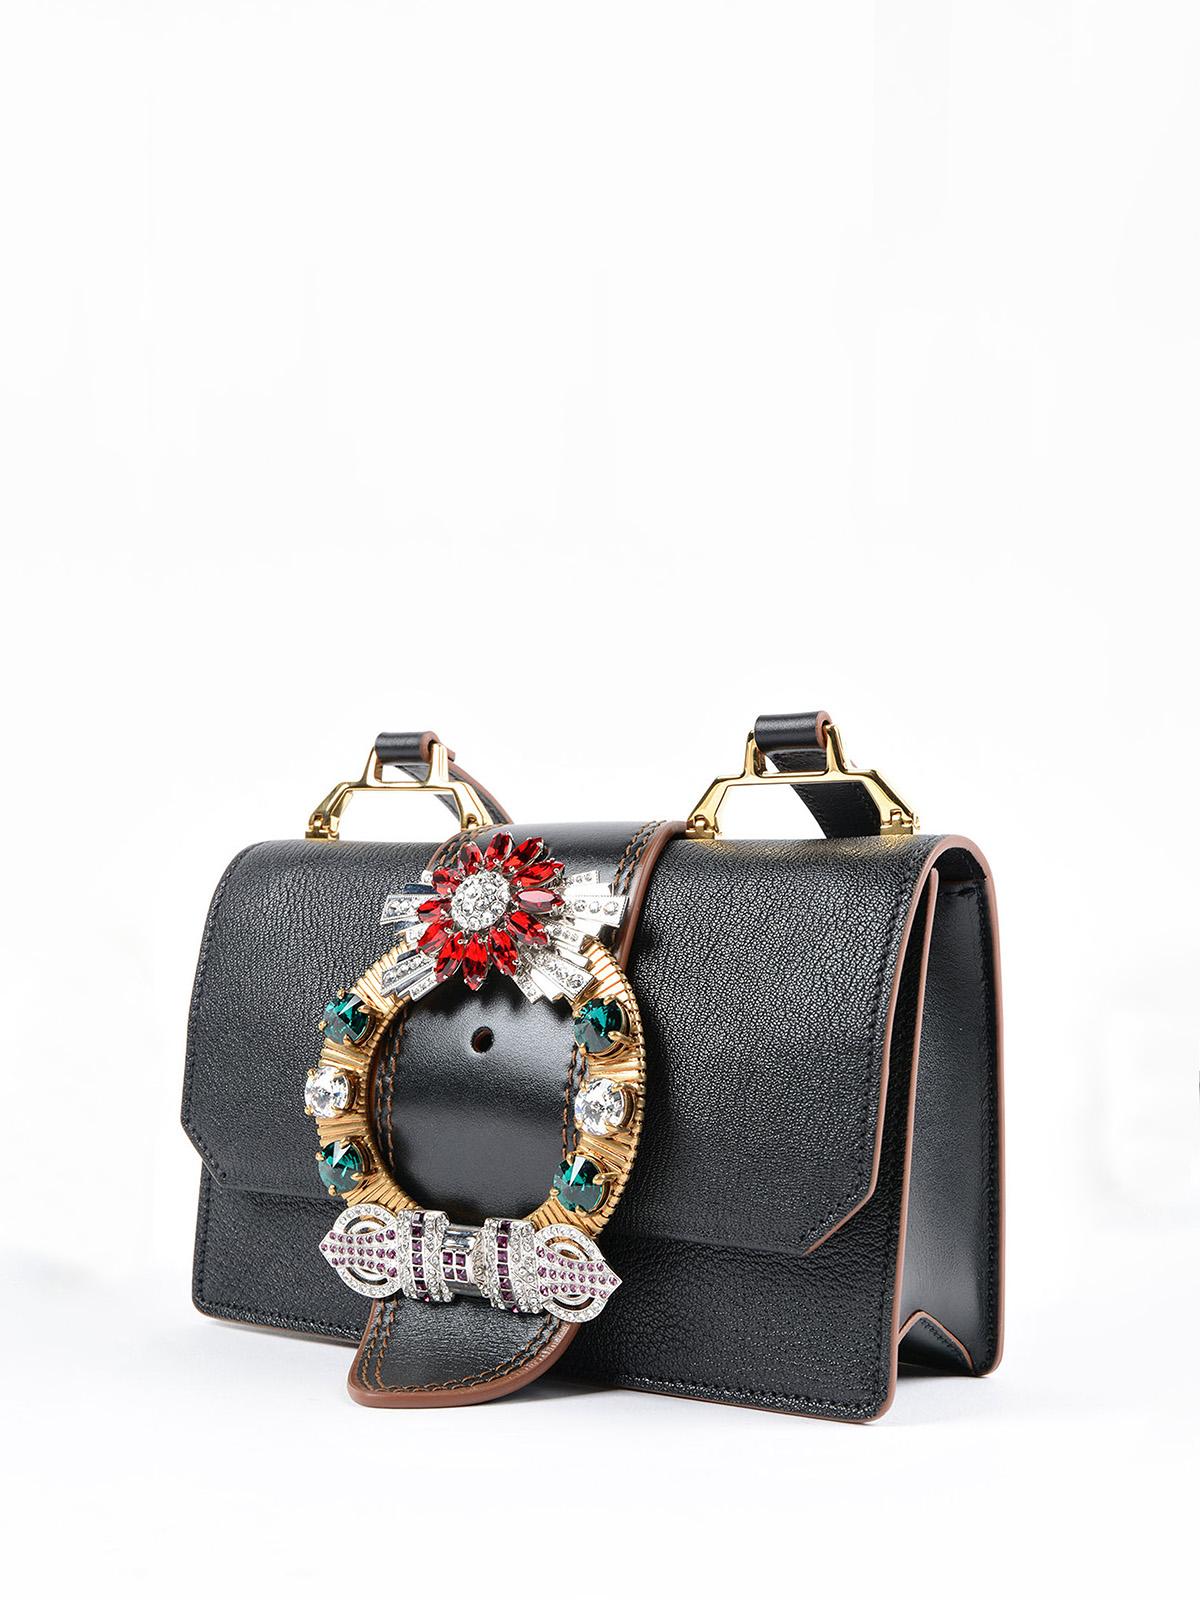 b363cac62da9 MIU MIU  cross body bags online - Miu Lady Bag jewel cross body bag